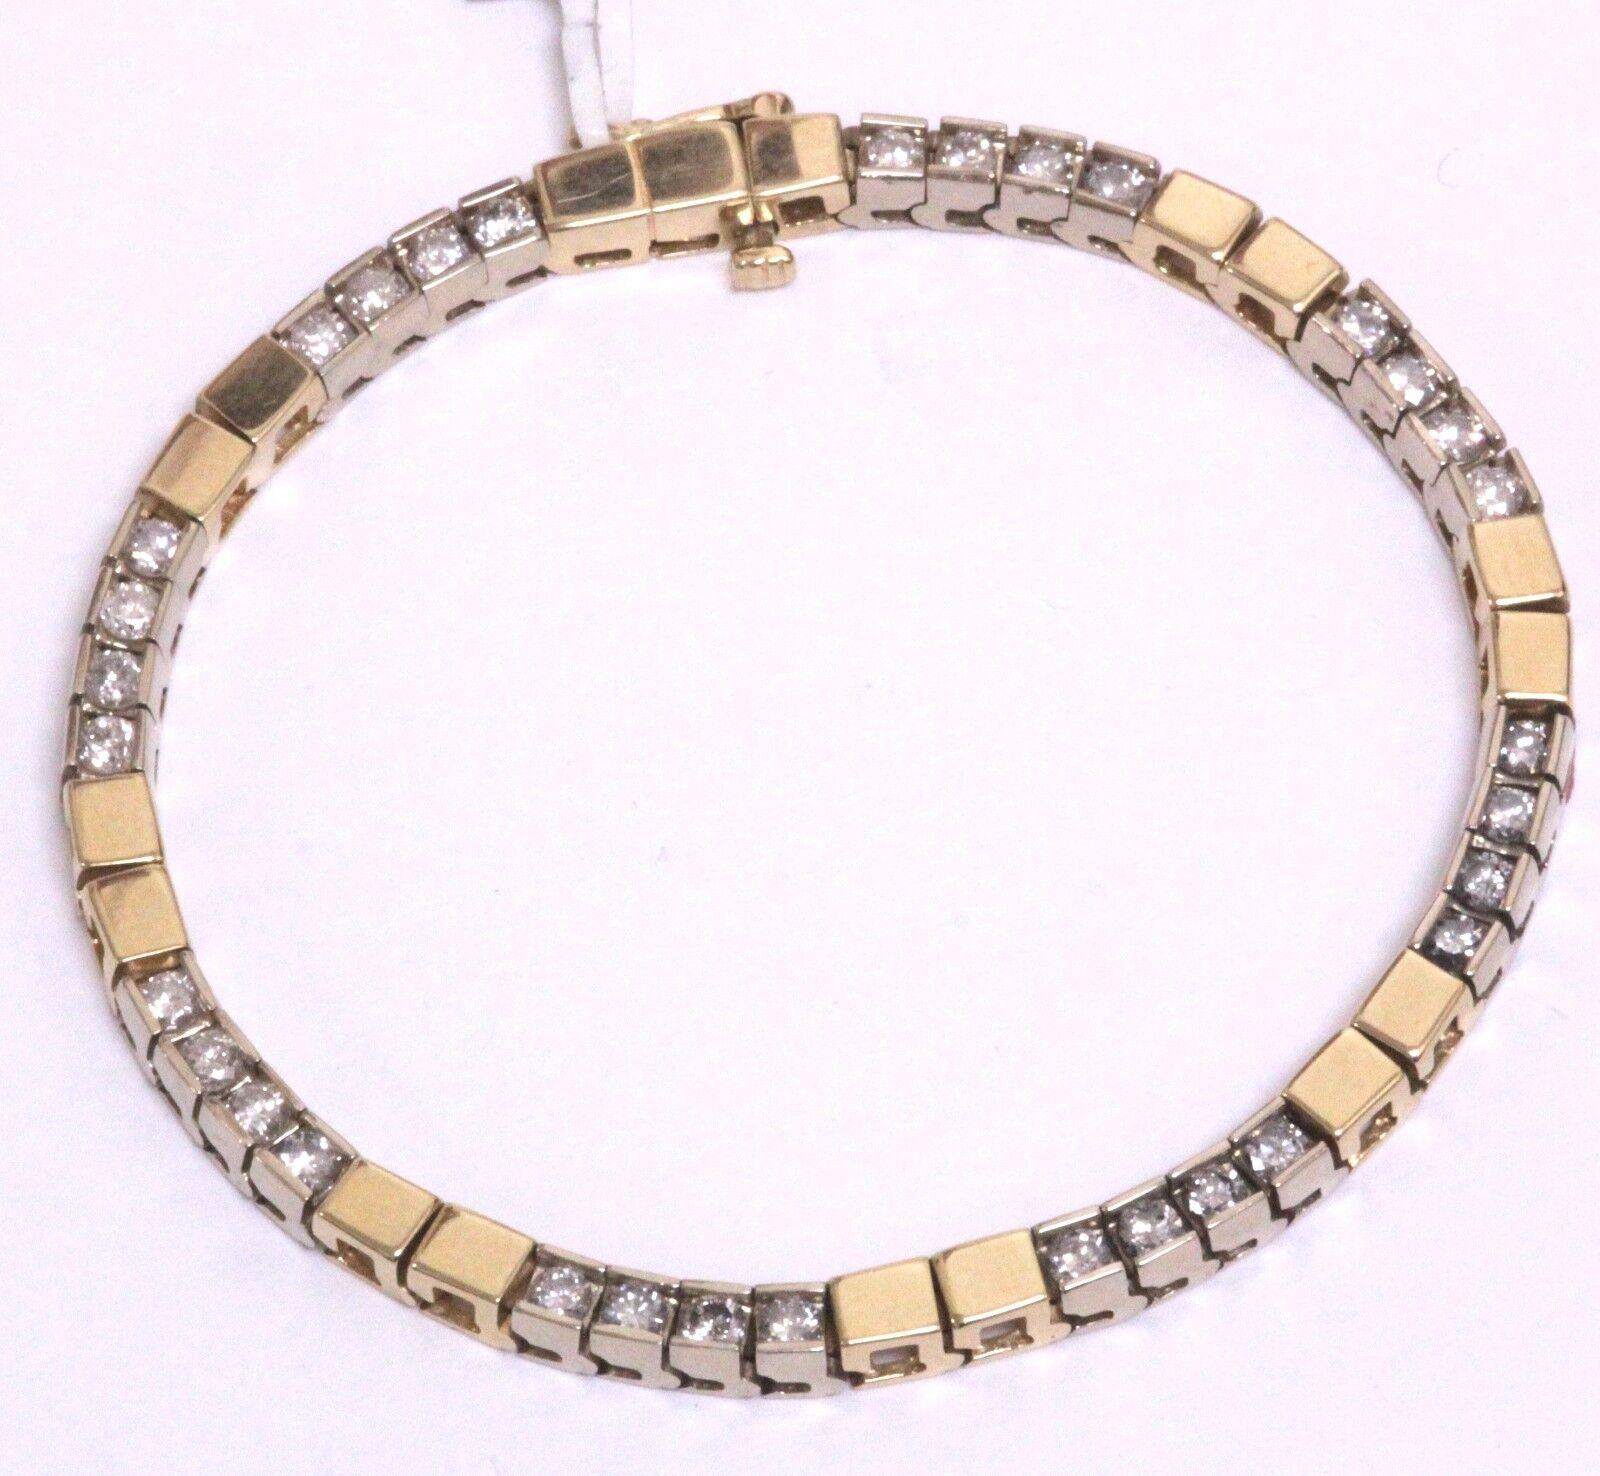 14k yellow white gold 3.20ct SI3 J diamond tennis bracelet 20.9g ladies estate